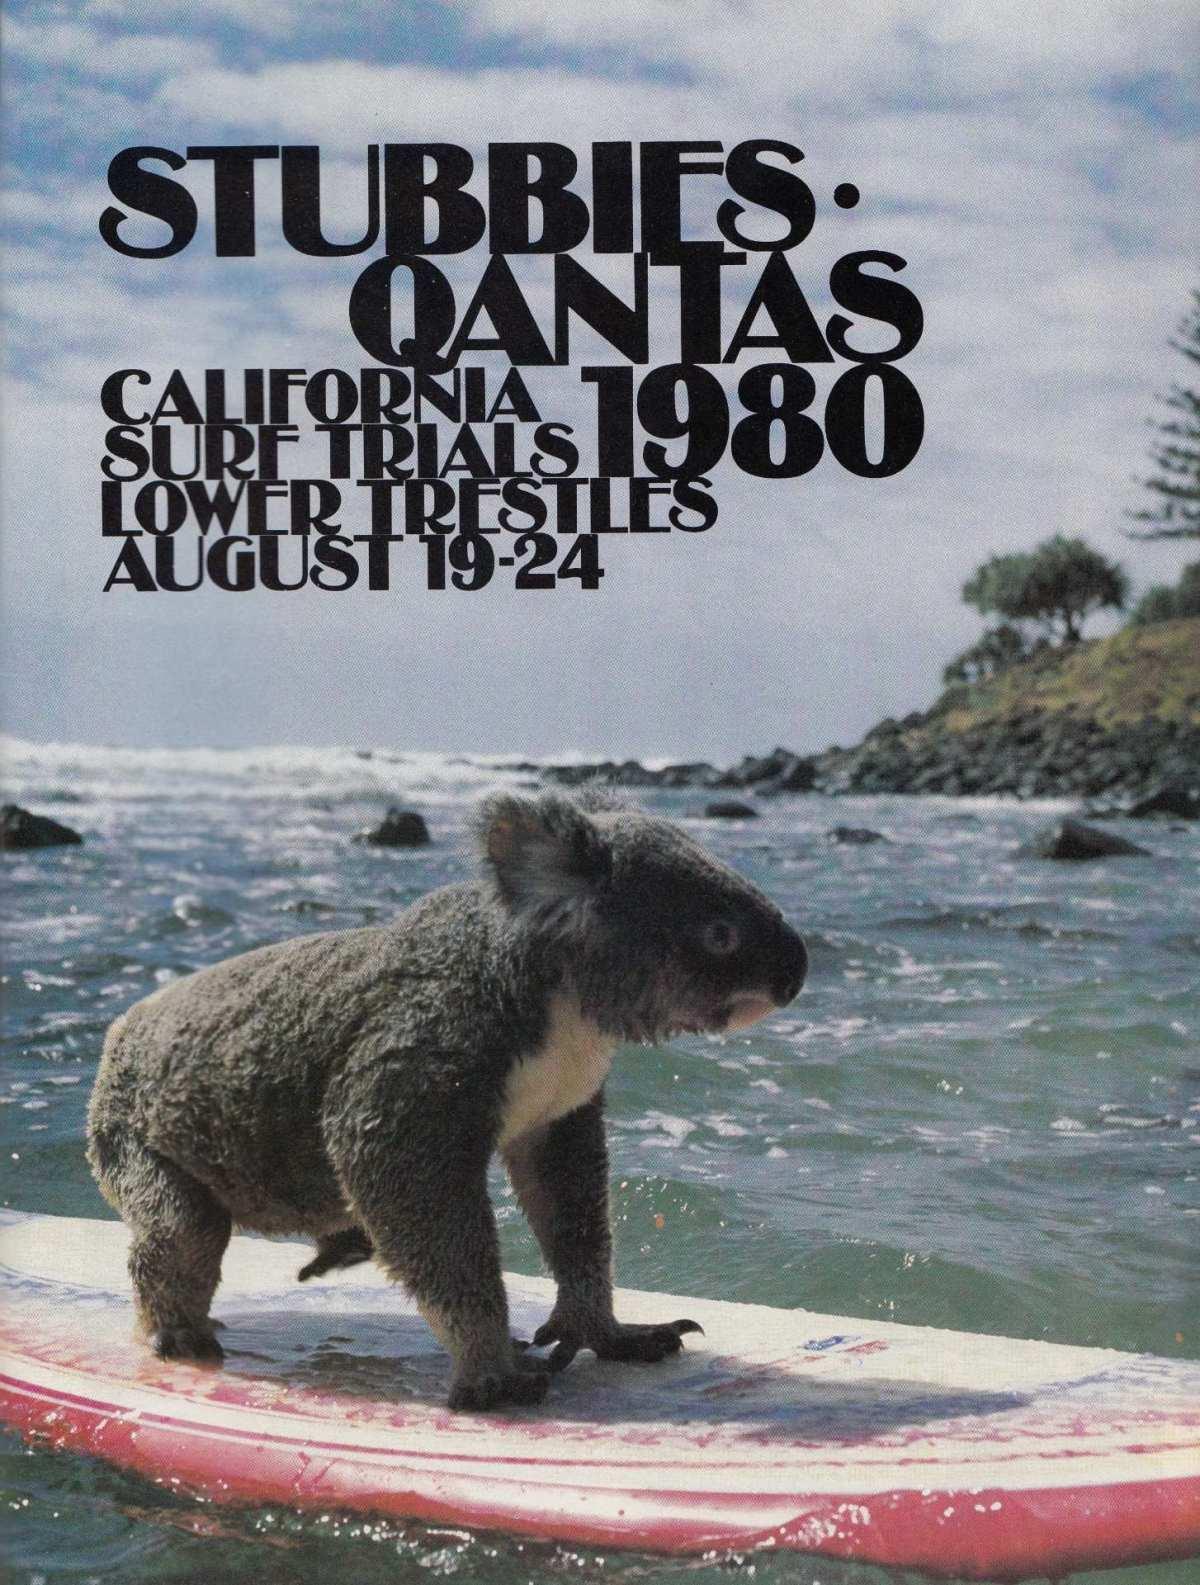 Qantas Stubbies California Surf Trials 1980